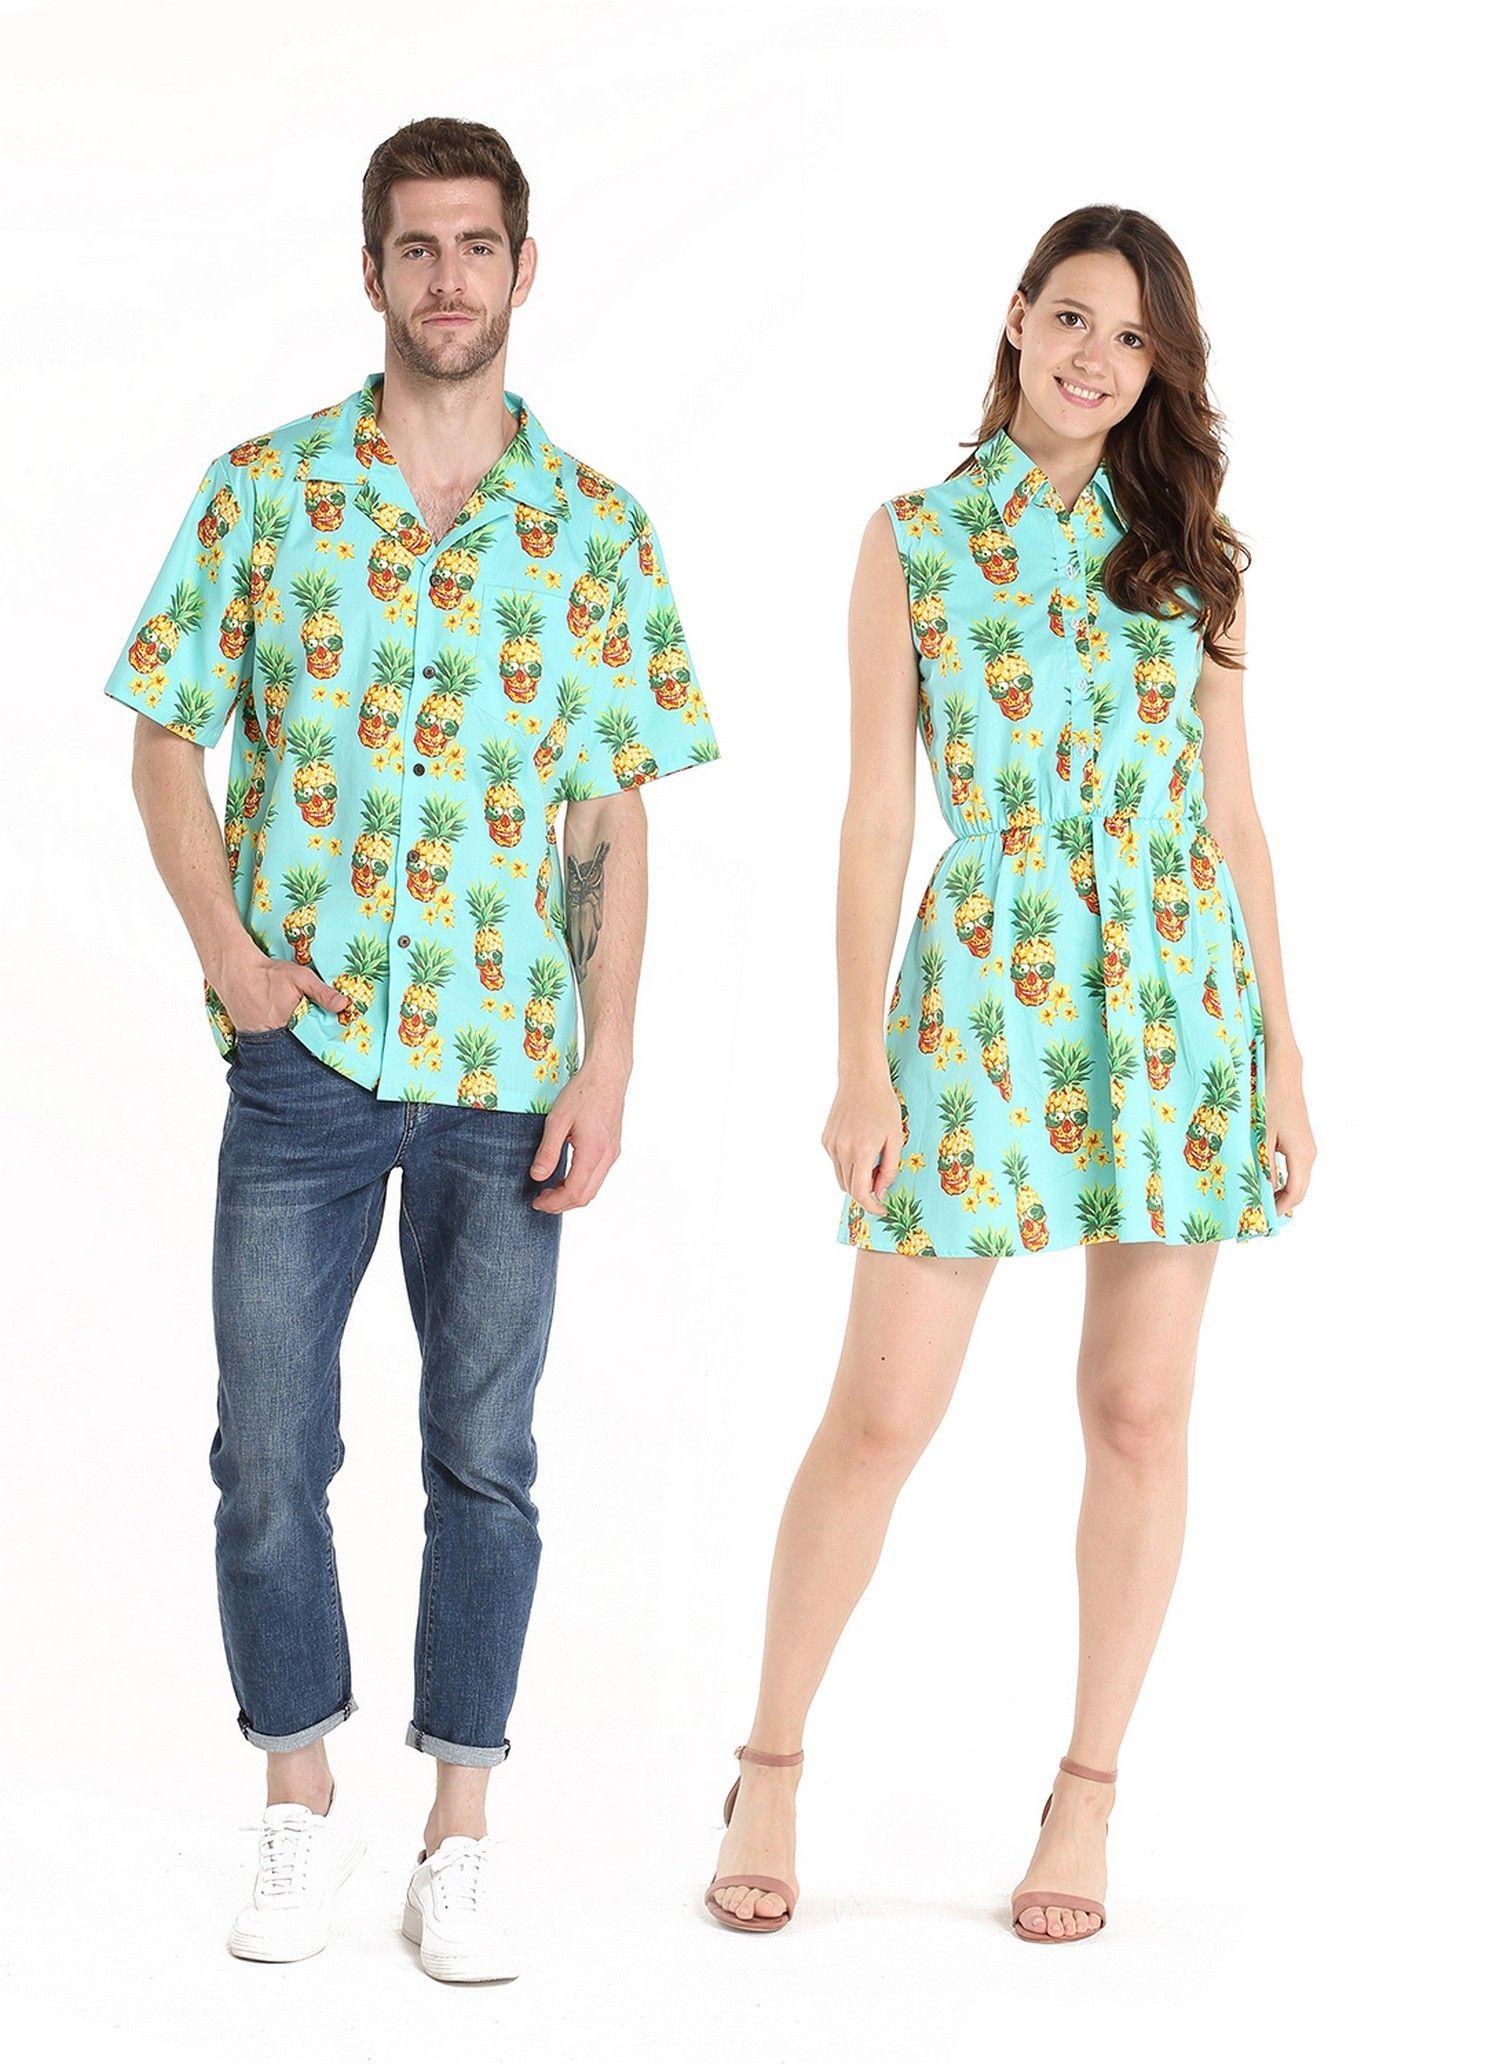 Pants Dress Set Girl Holloween Beach Hawaiian Cruise Luau Floral Turquoise Flora